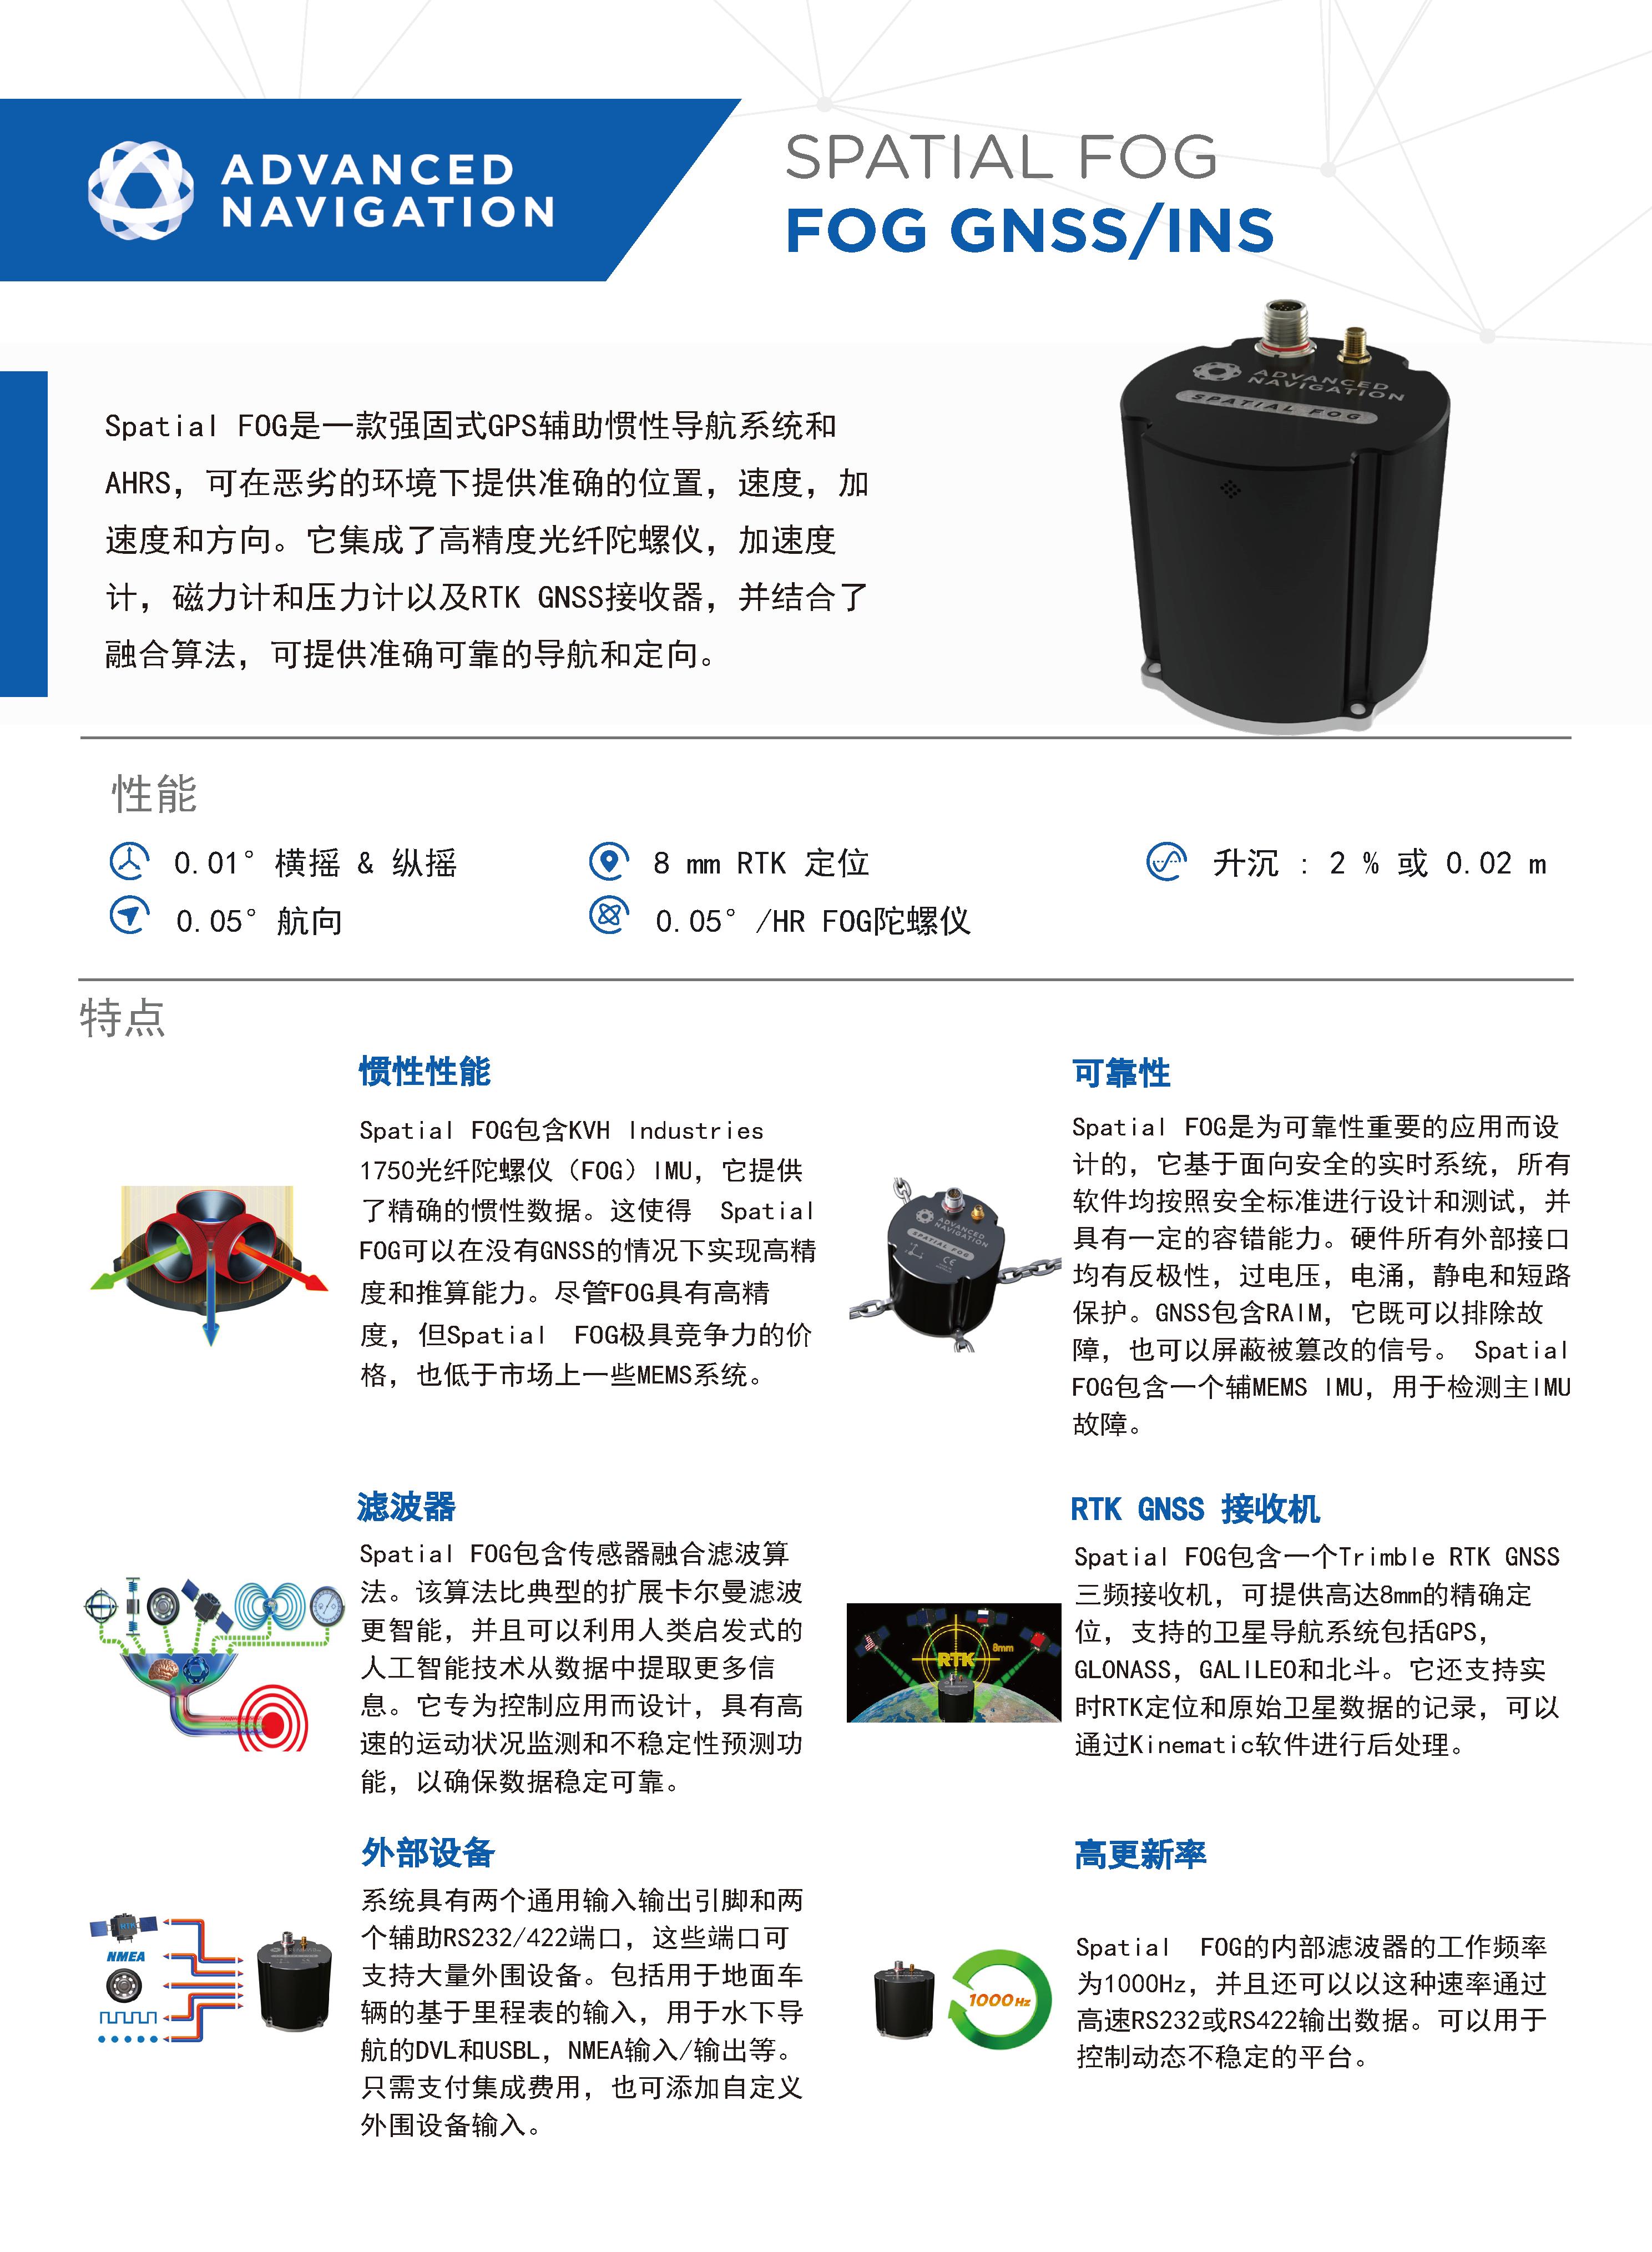 Spatial FOG GNSS/INS光纤惯性导航系统